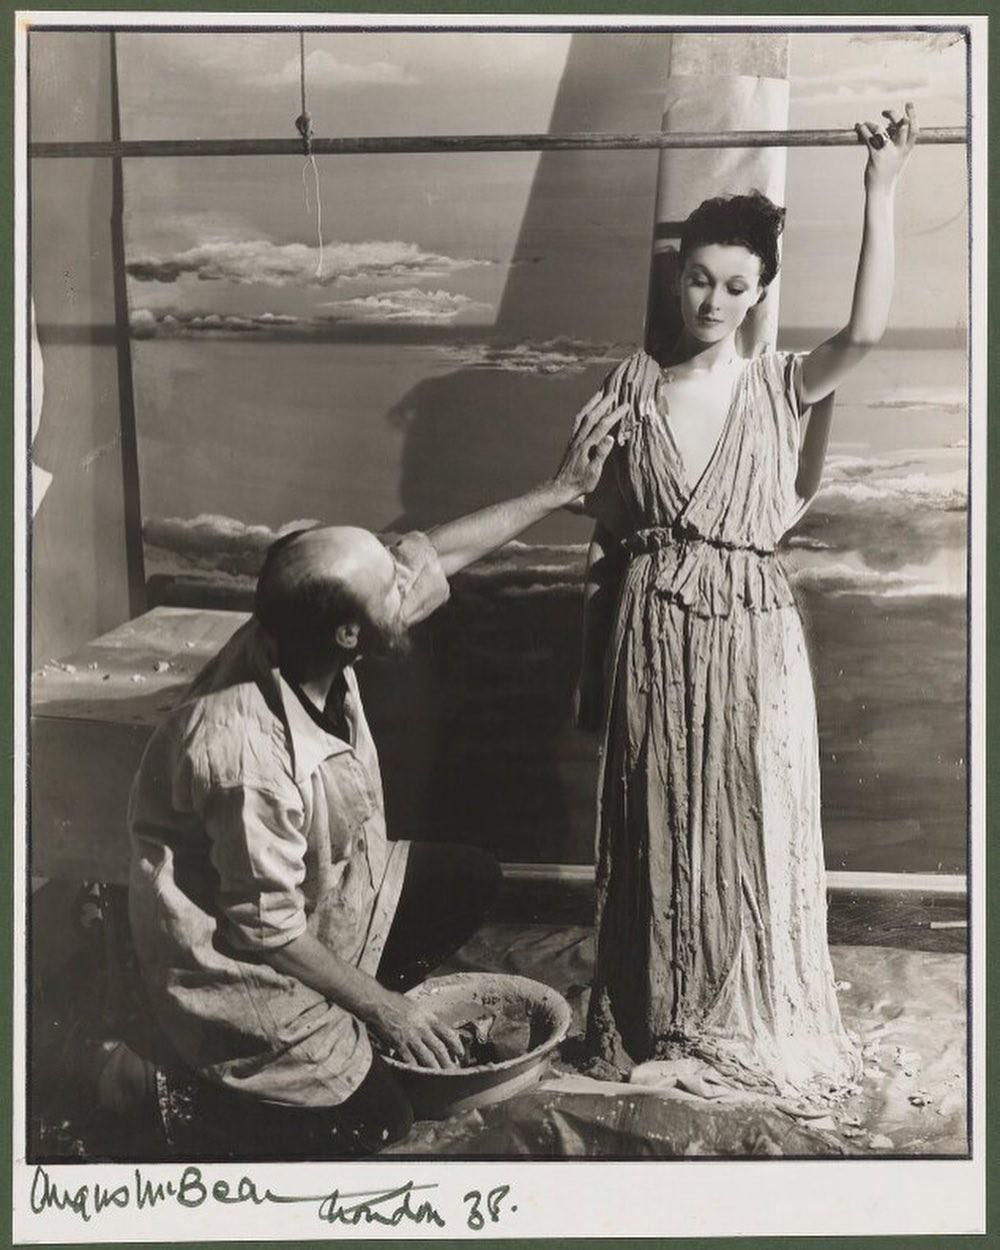 Вивьен Ли, 1938. Ангус МакБин